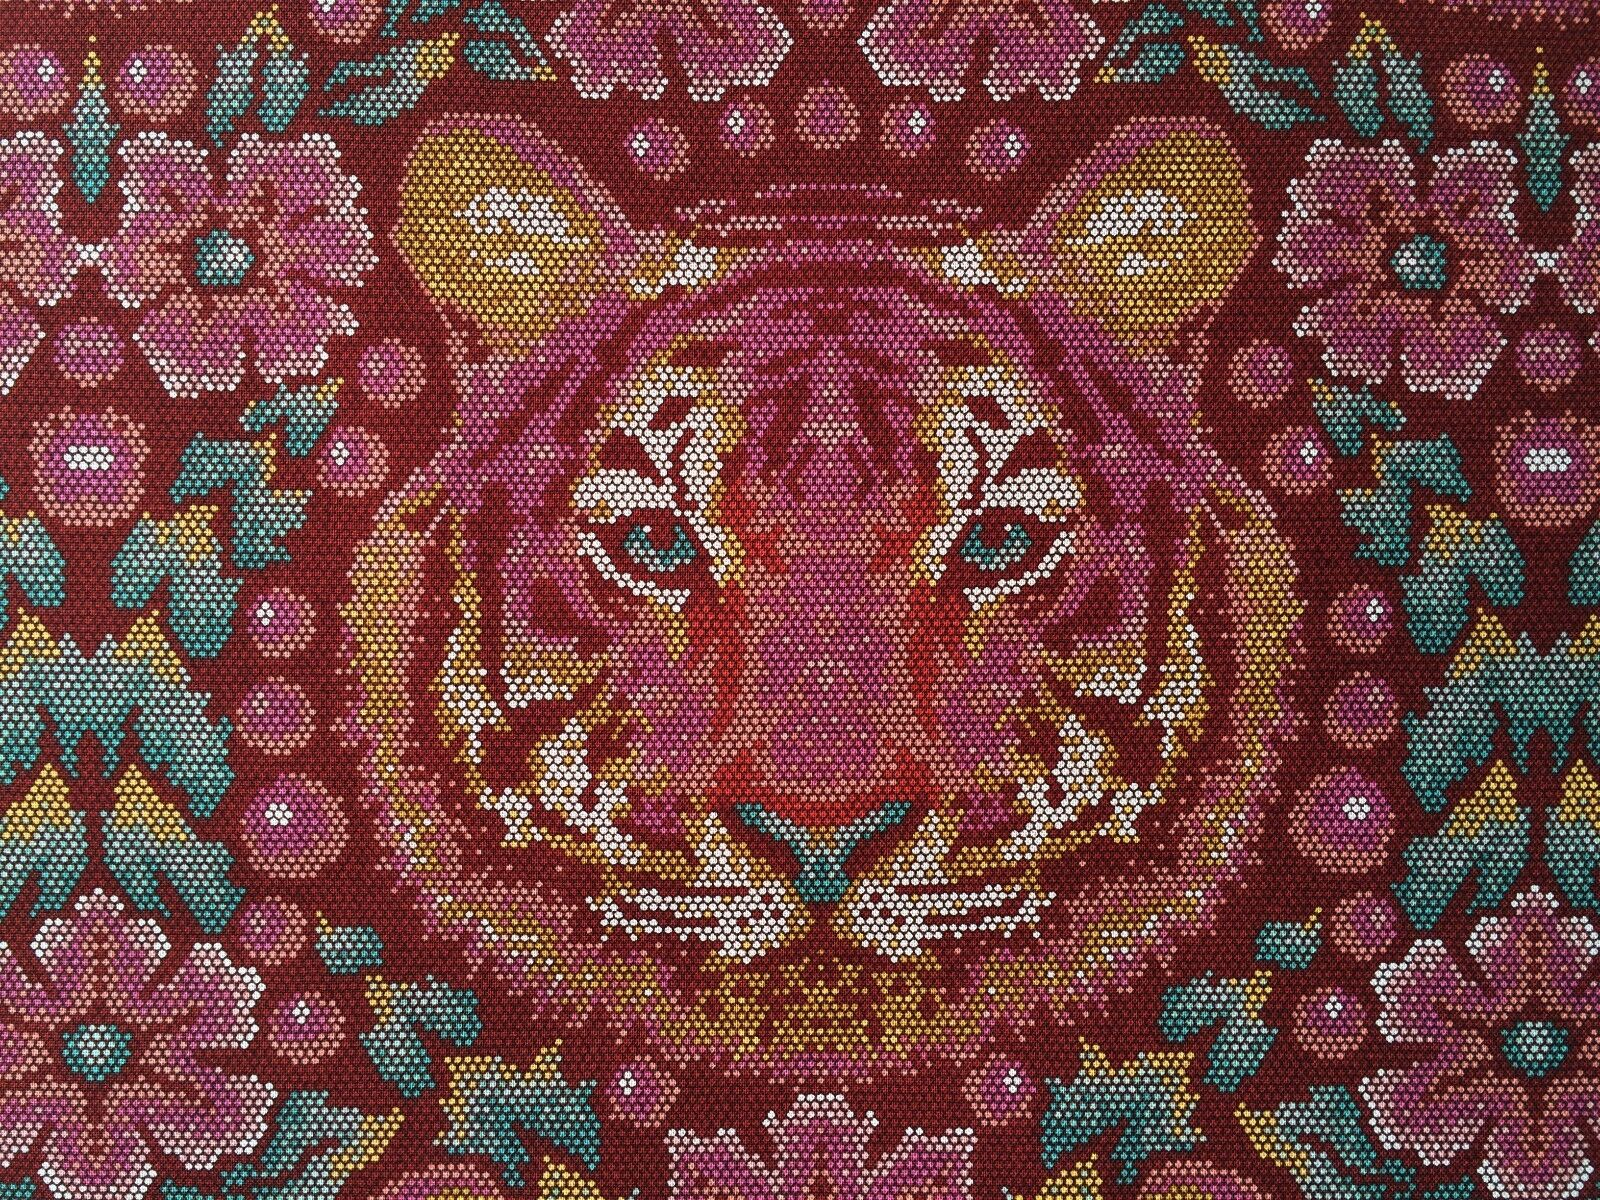 By 1//2 Yard Free Spirit Eden Tula Pink Fabric ~ Crouching Tiger Tourmaline ~ red